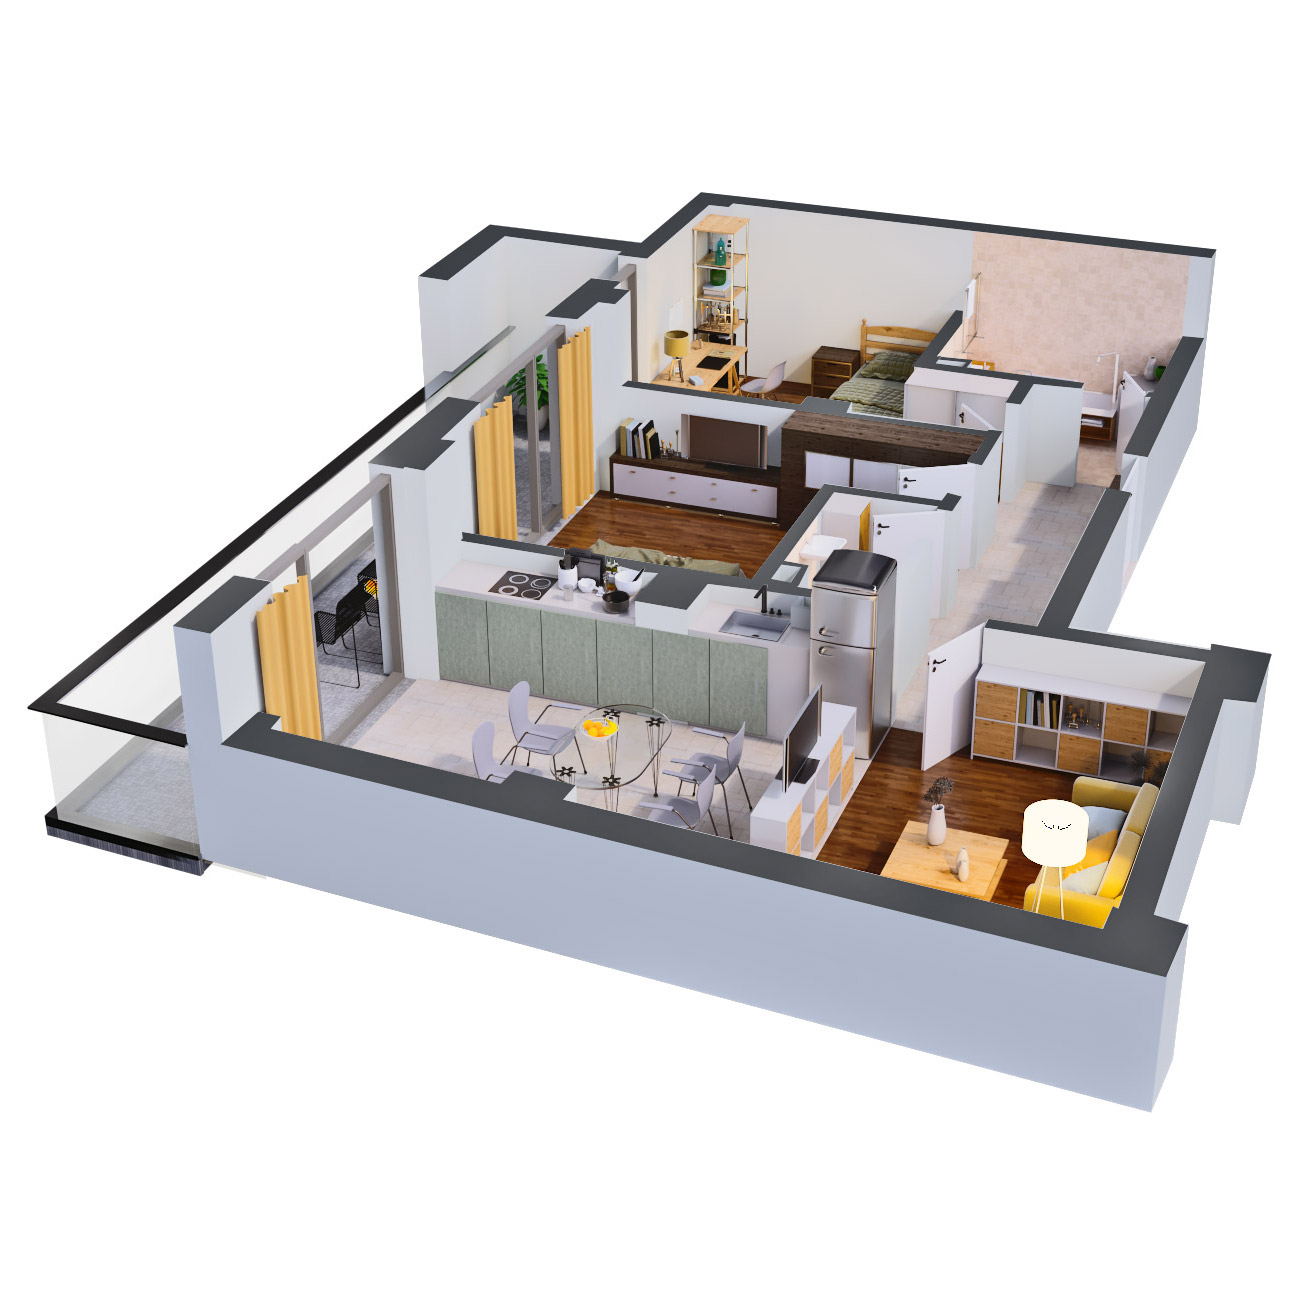 Apartament 3 camere de vanzare Bucuresti - Catedral Residence - Marriott, Piata Unirii, 13 Septembrie, Izvor - Tip 4 - T2A - C